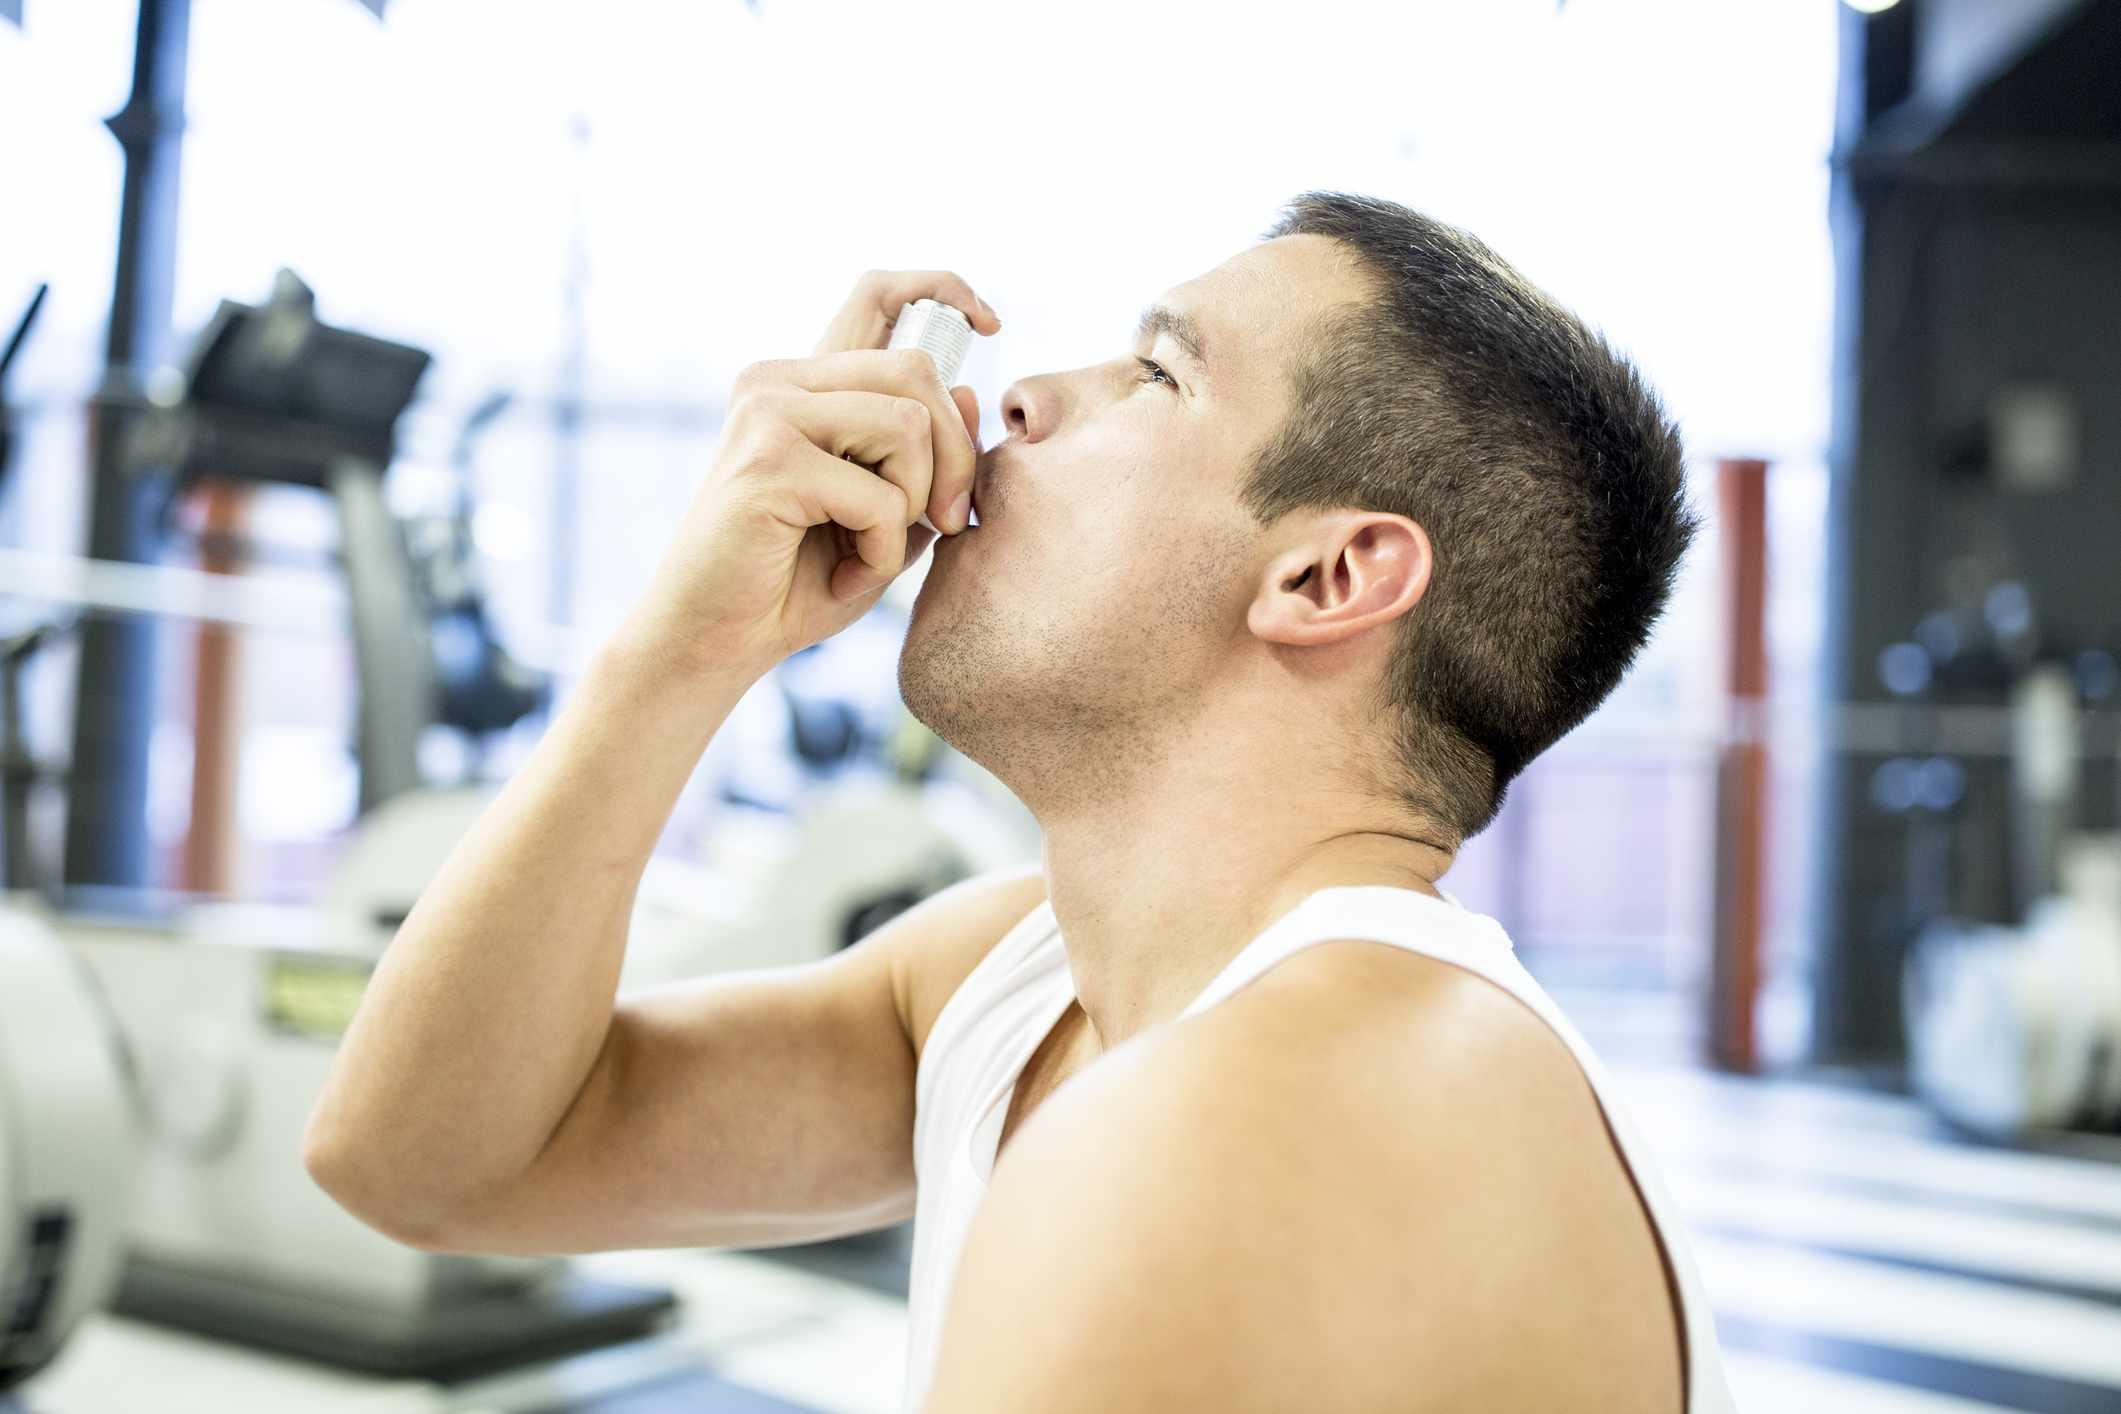 Young man using inhaler at gym